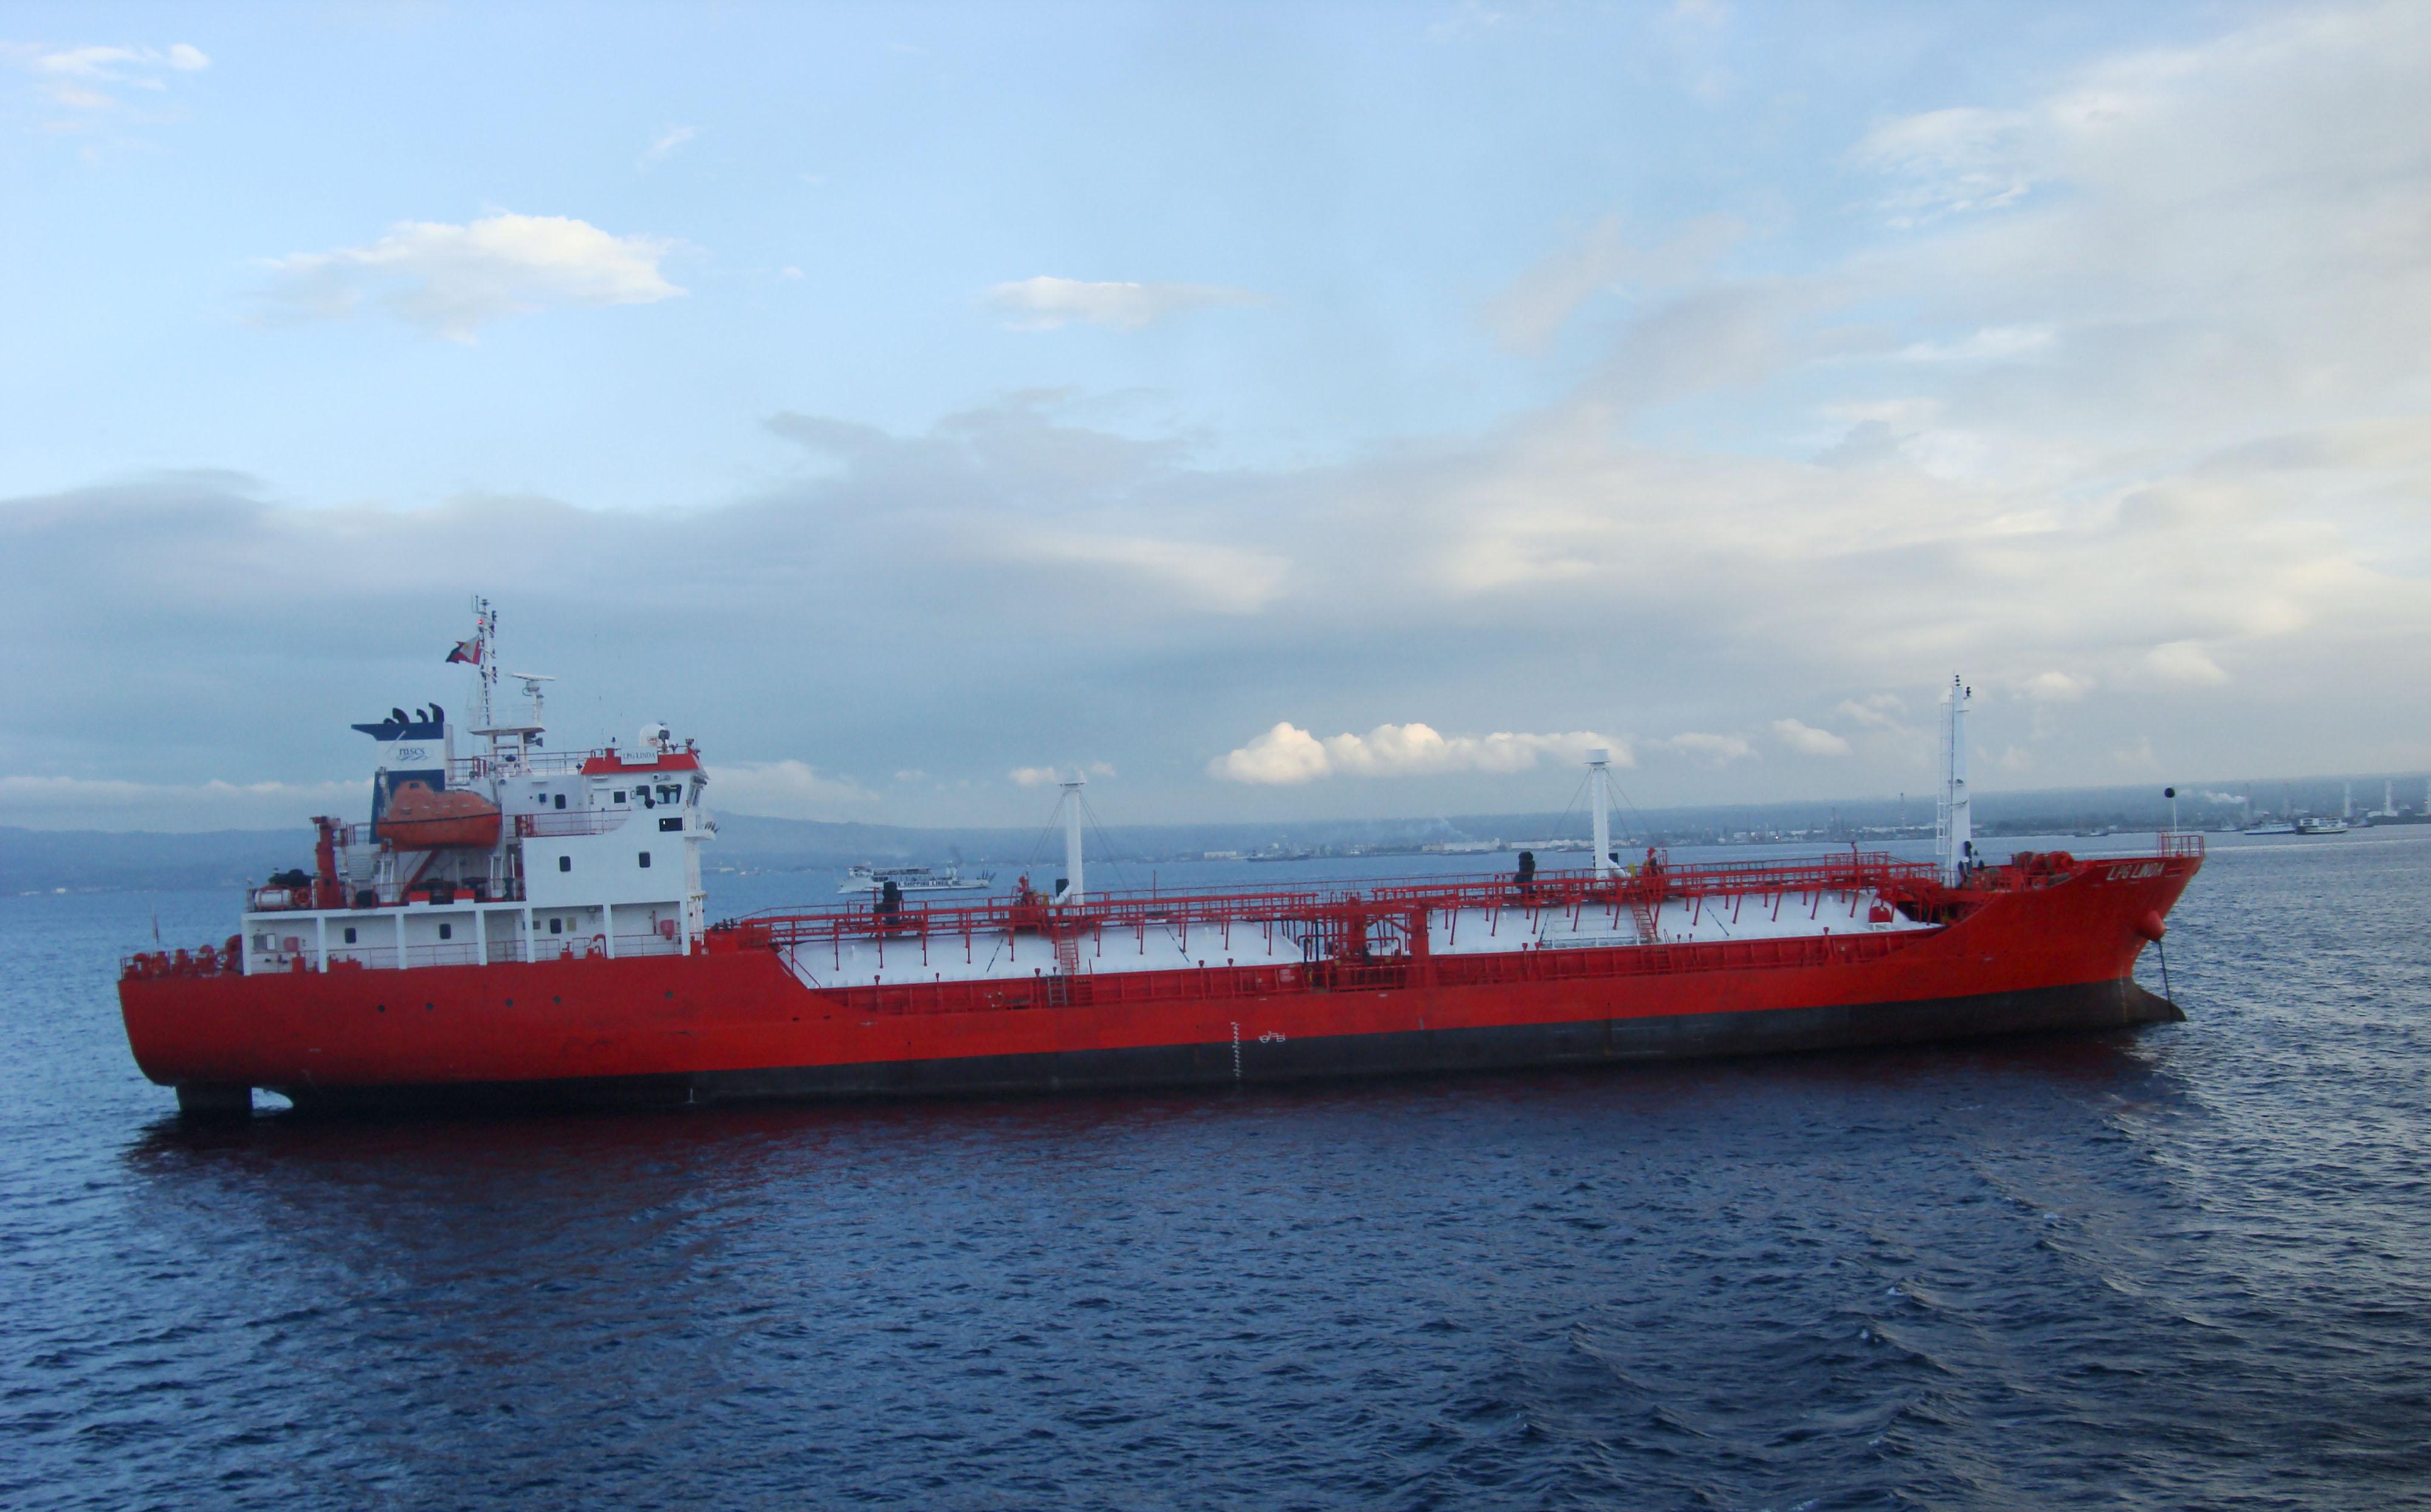 MV LPG Linda liquid gas ship Batangas Philippines 01